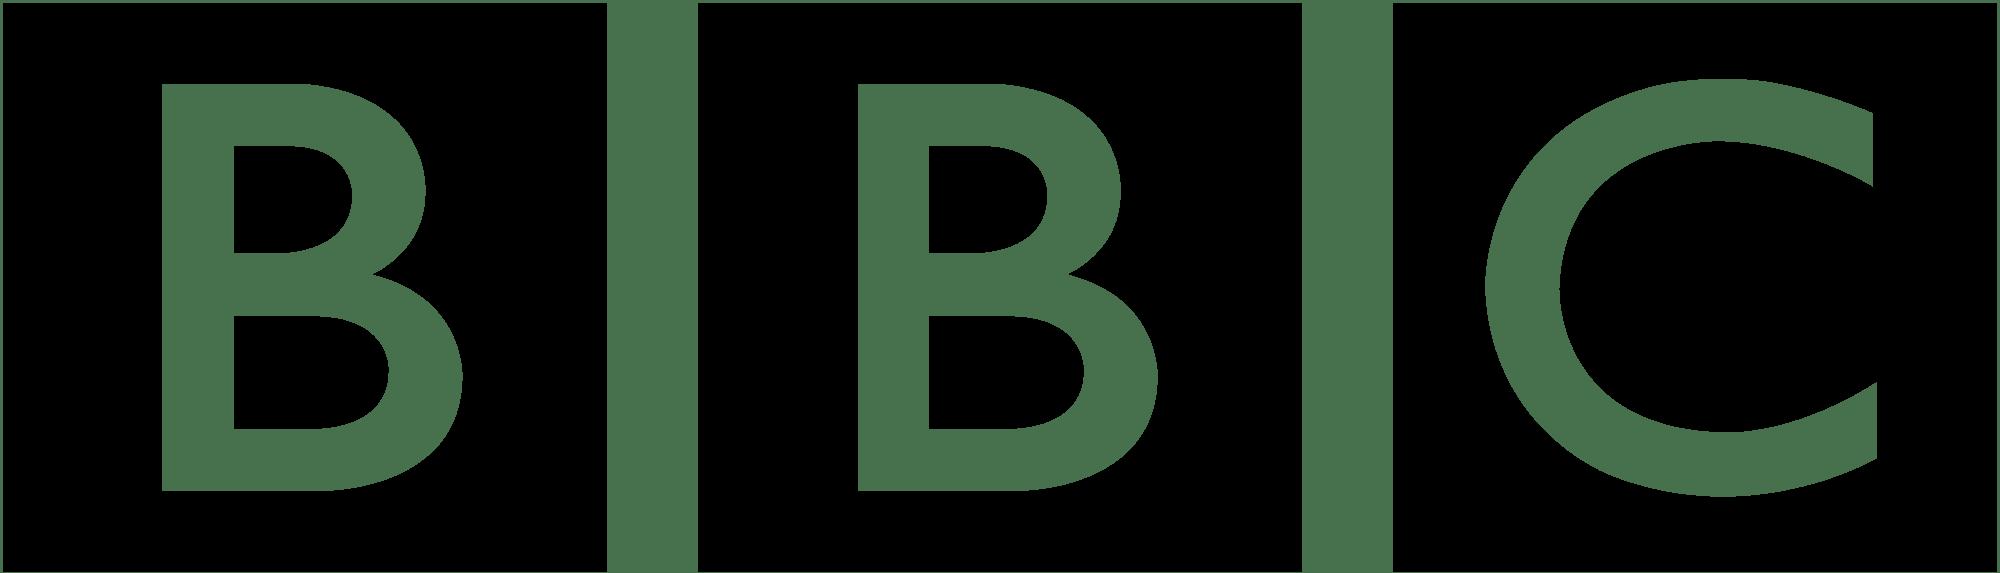 Bbc Logo Transparent Png - Pluspng - Bbc Logo PNG